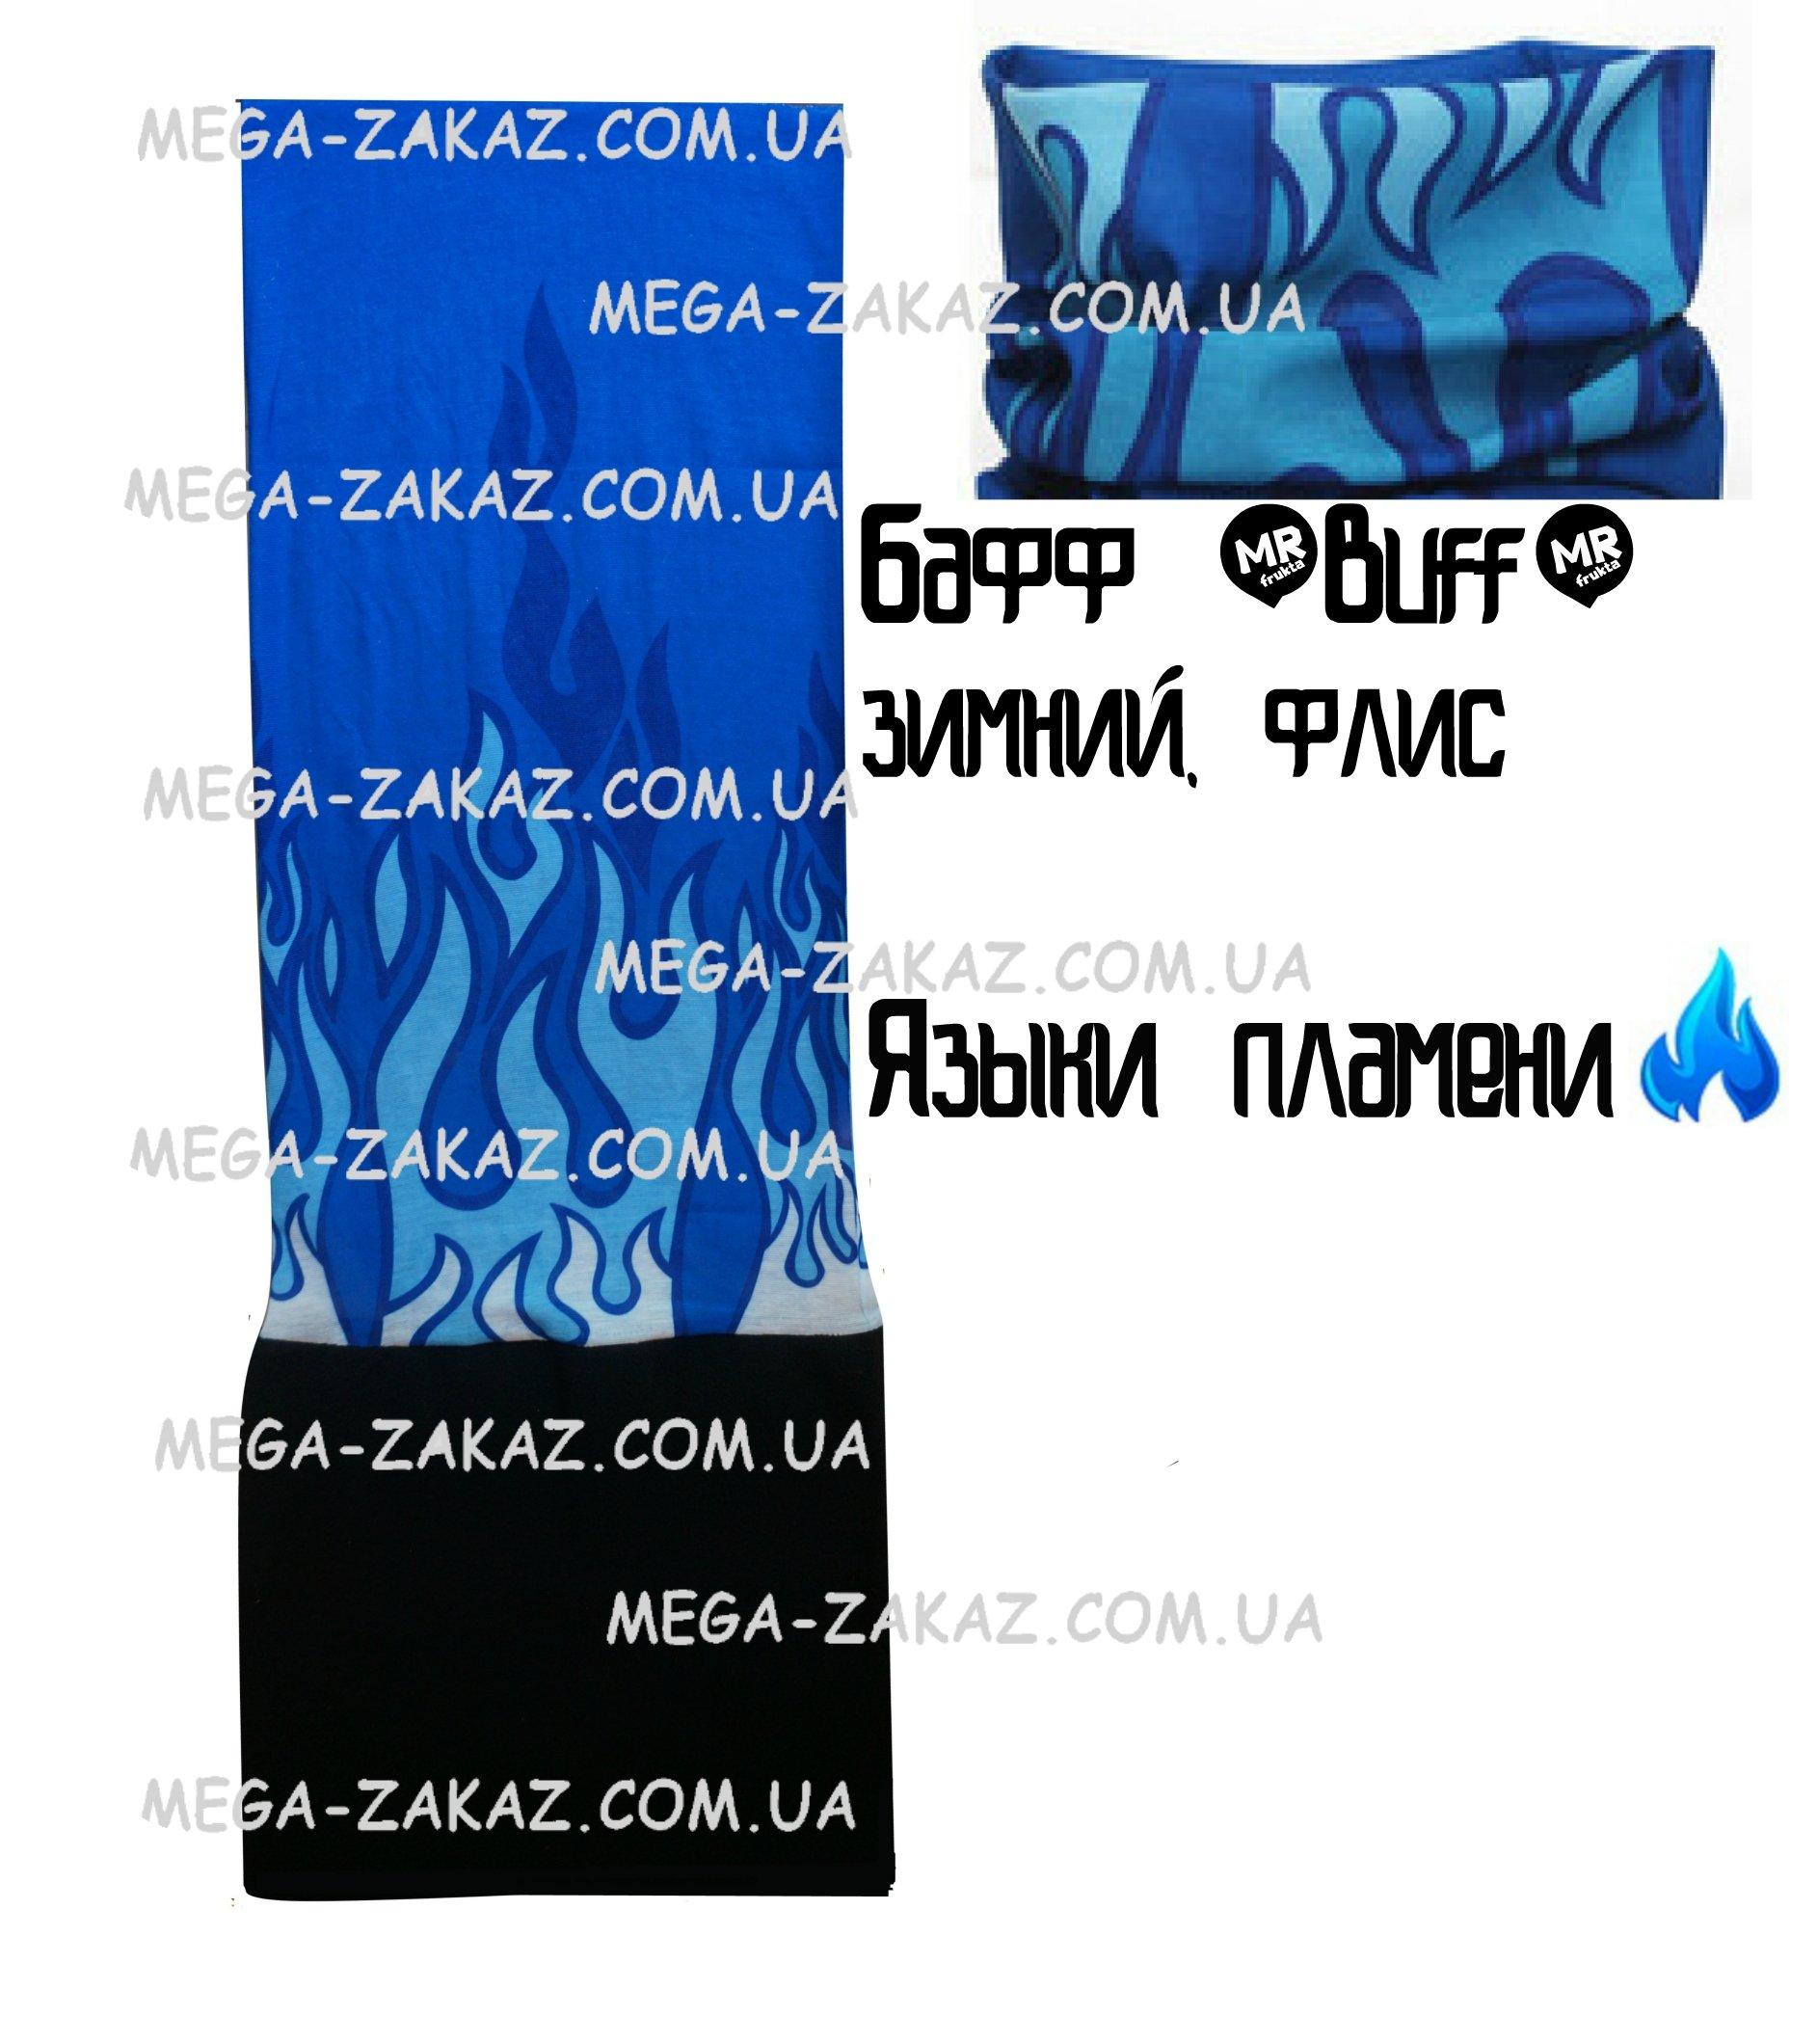 https://mega-zakaz.com.ua/images/upload/blue%20(2)ZAKAZ.jpg